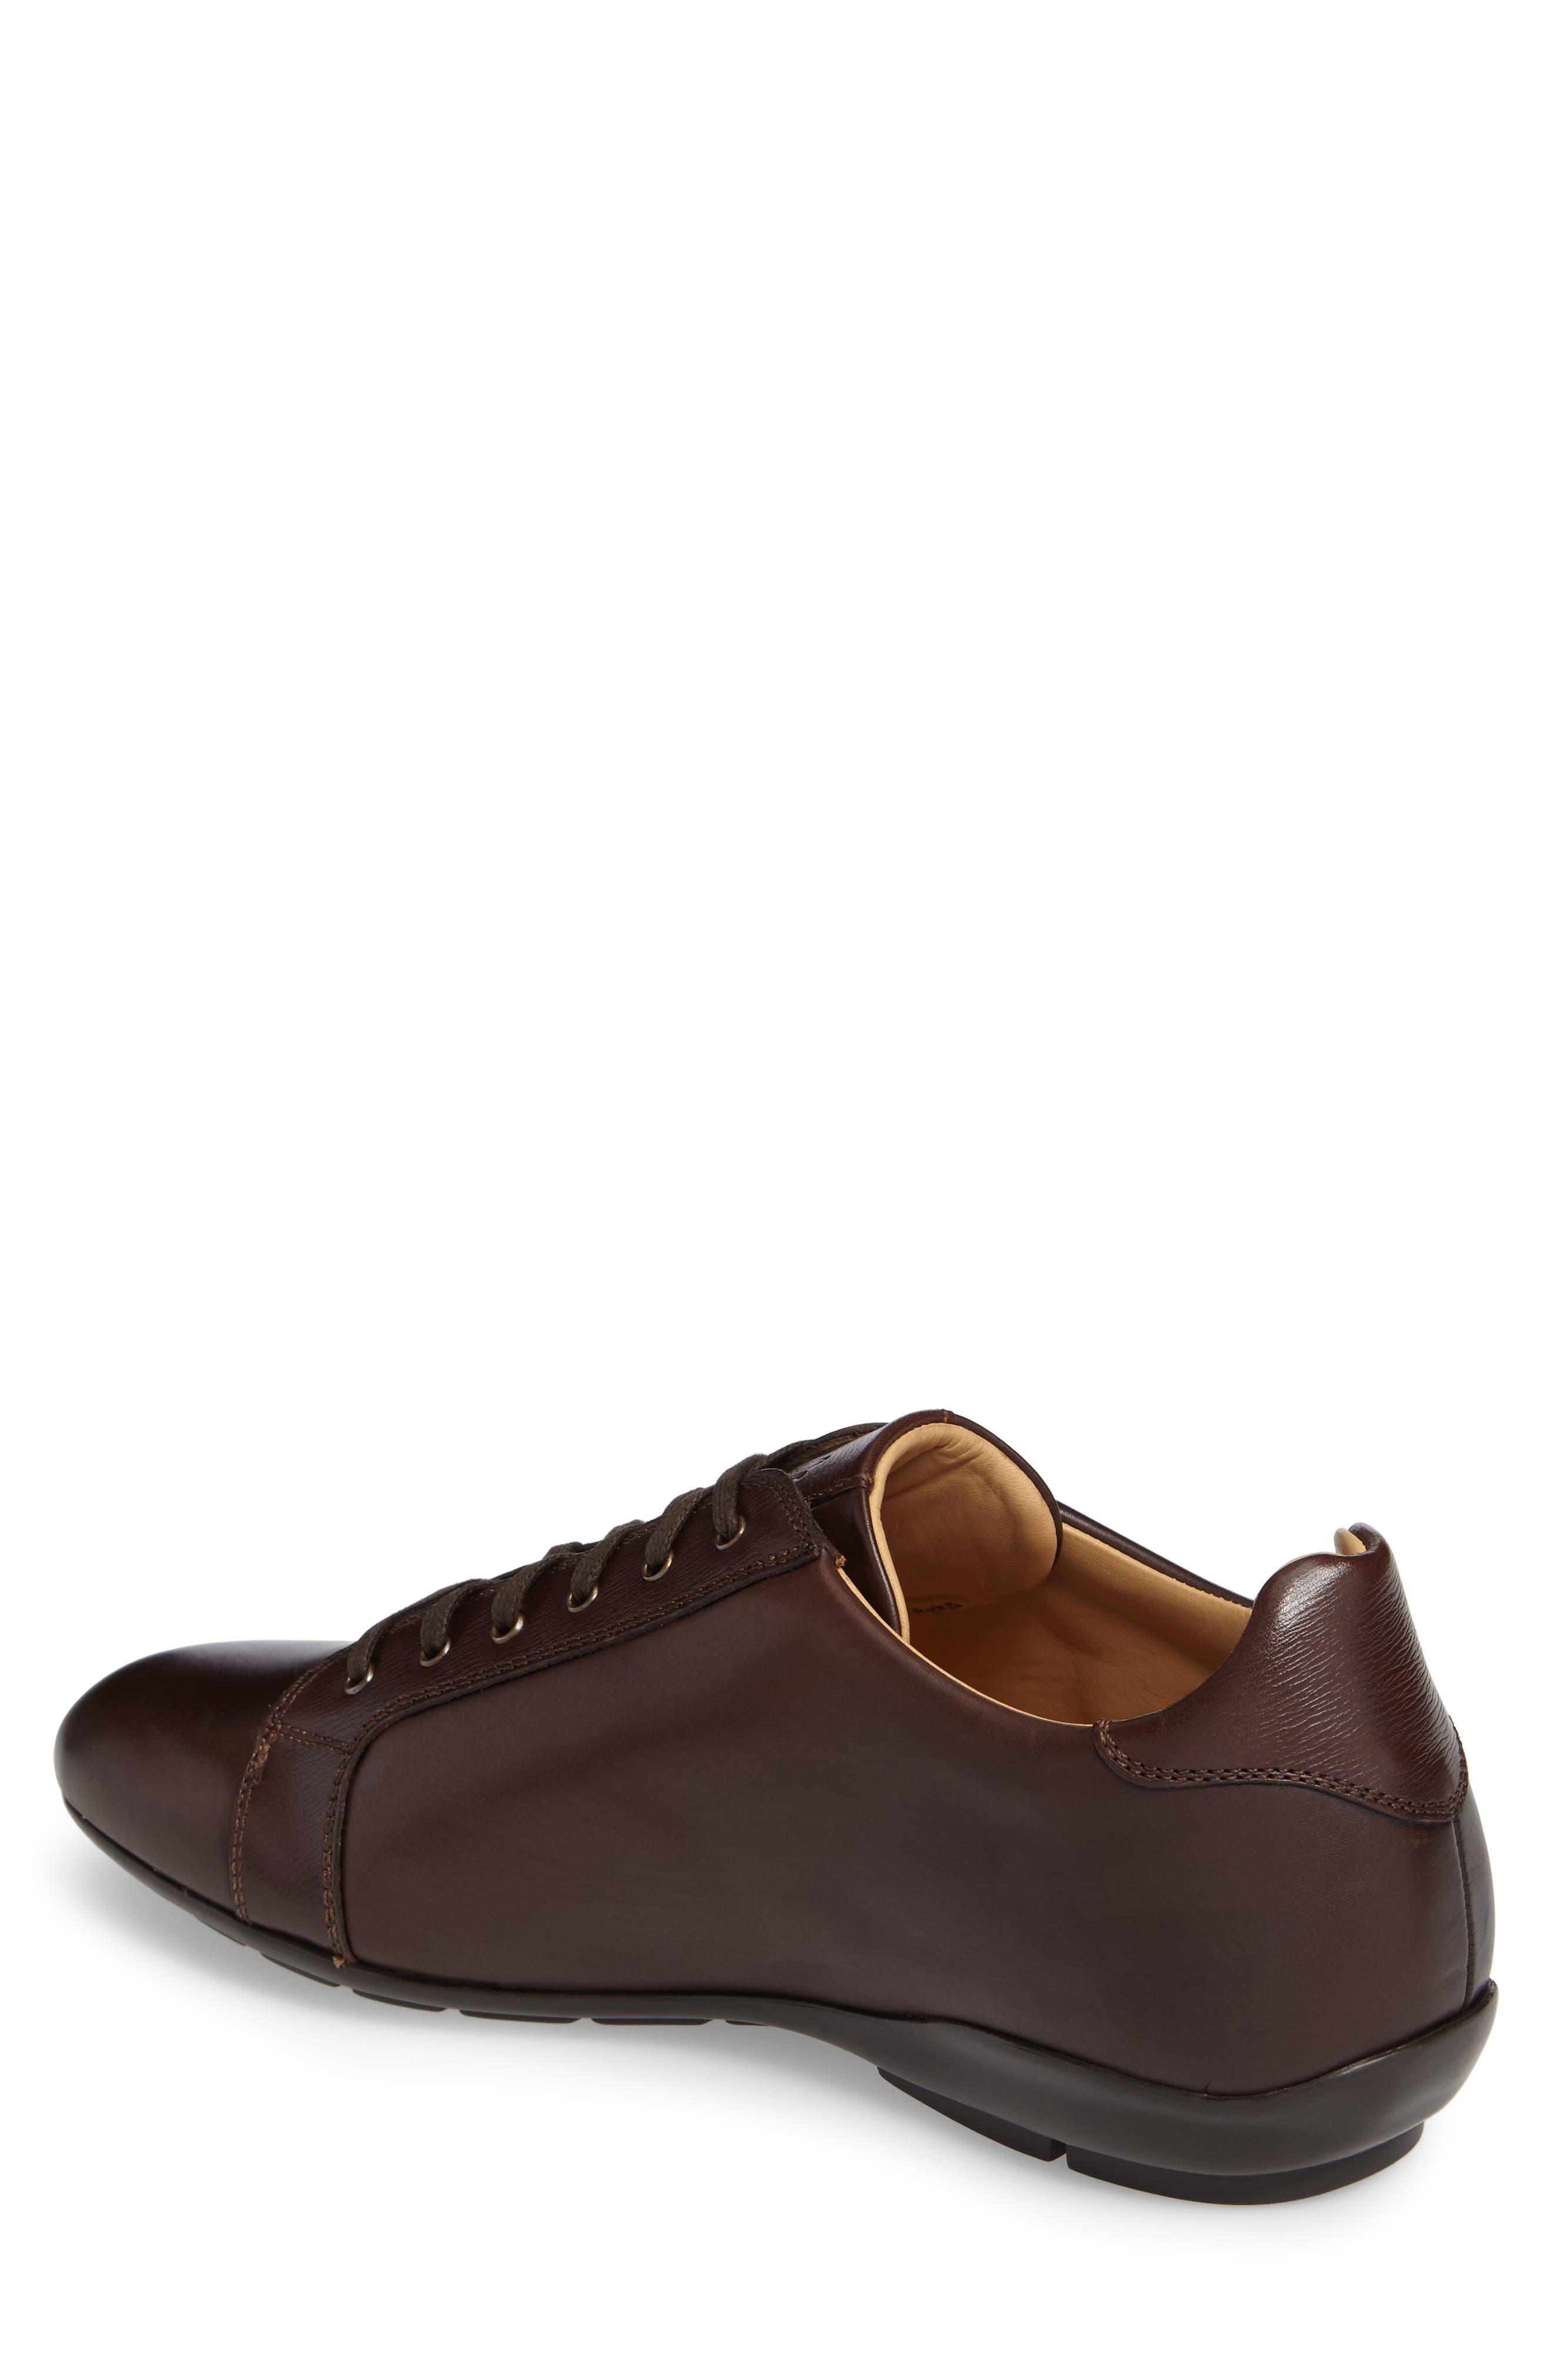 Ubrique Sneaker,                             Alternate thumbnail 2, color,                             Brown Multi Leather